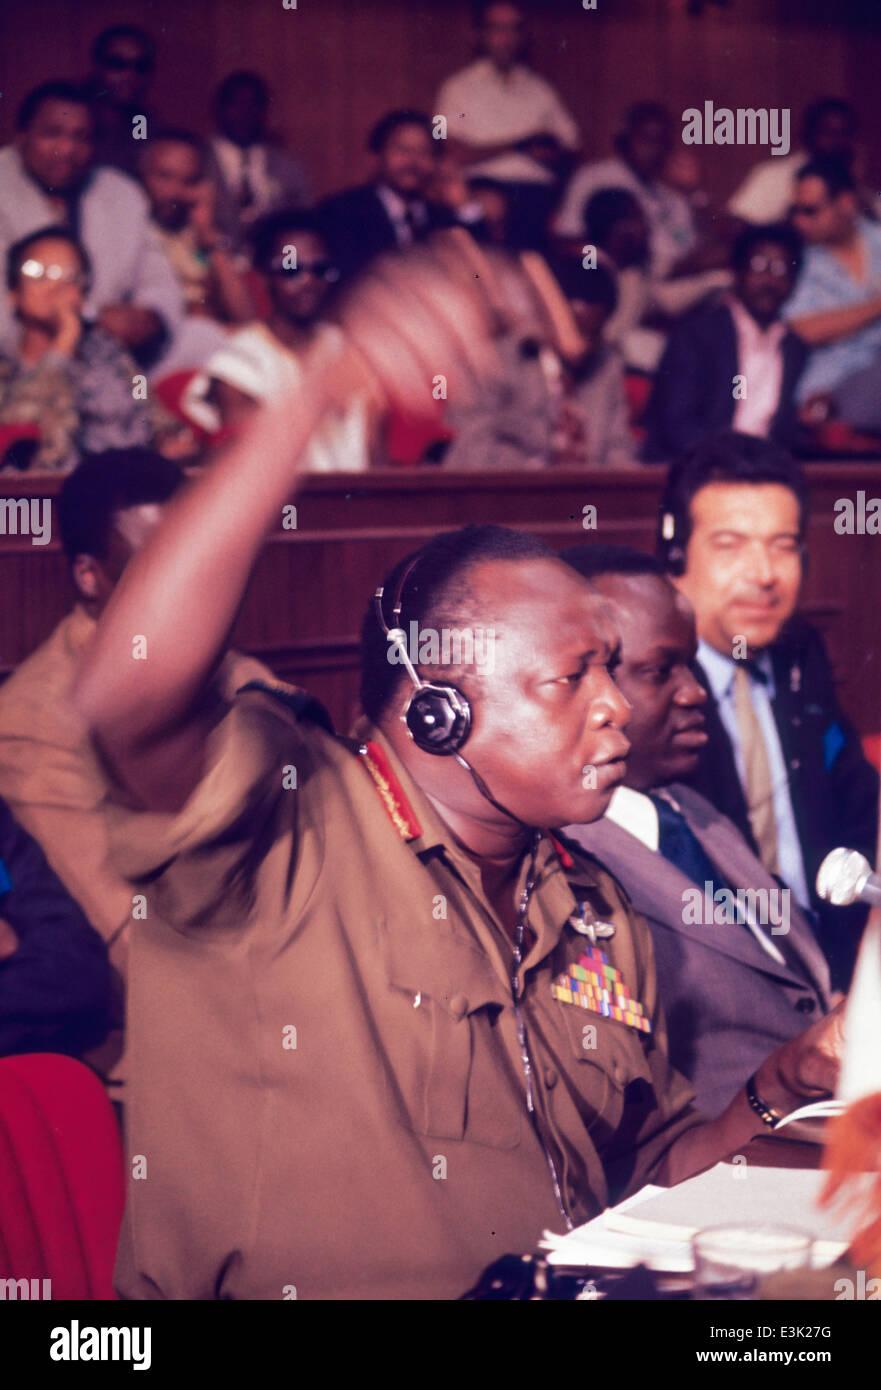 Idi Amin Dada,70's Photo Stock